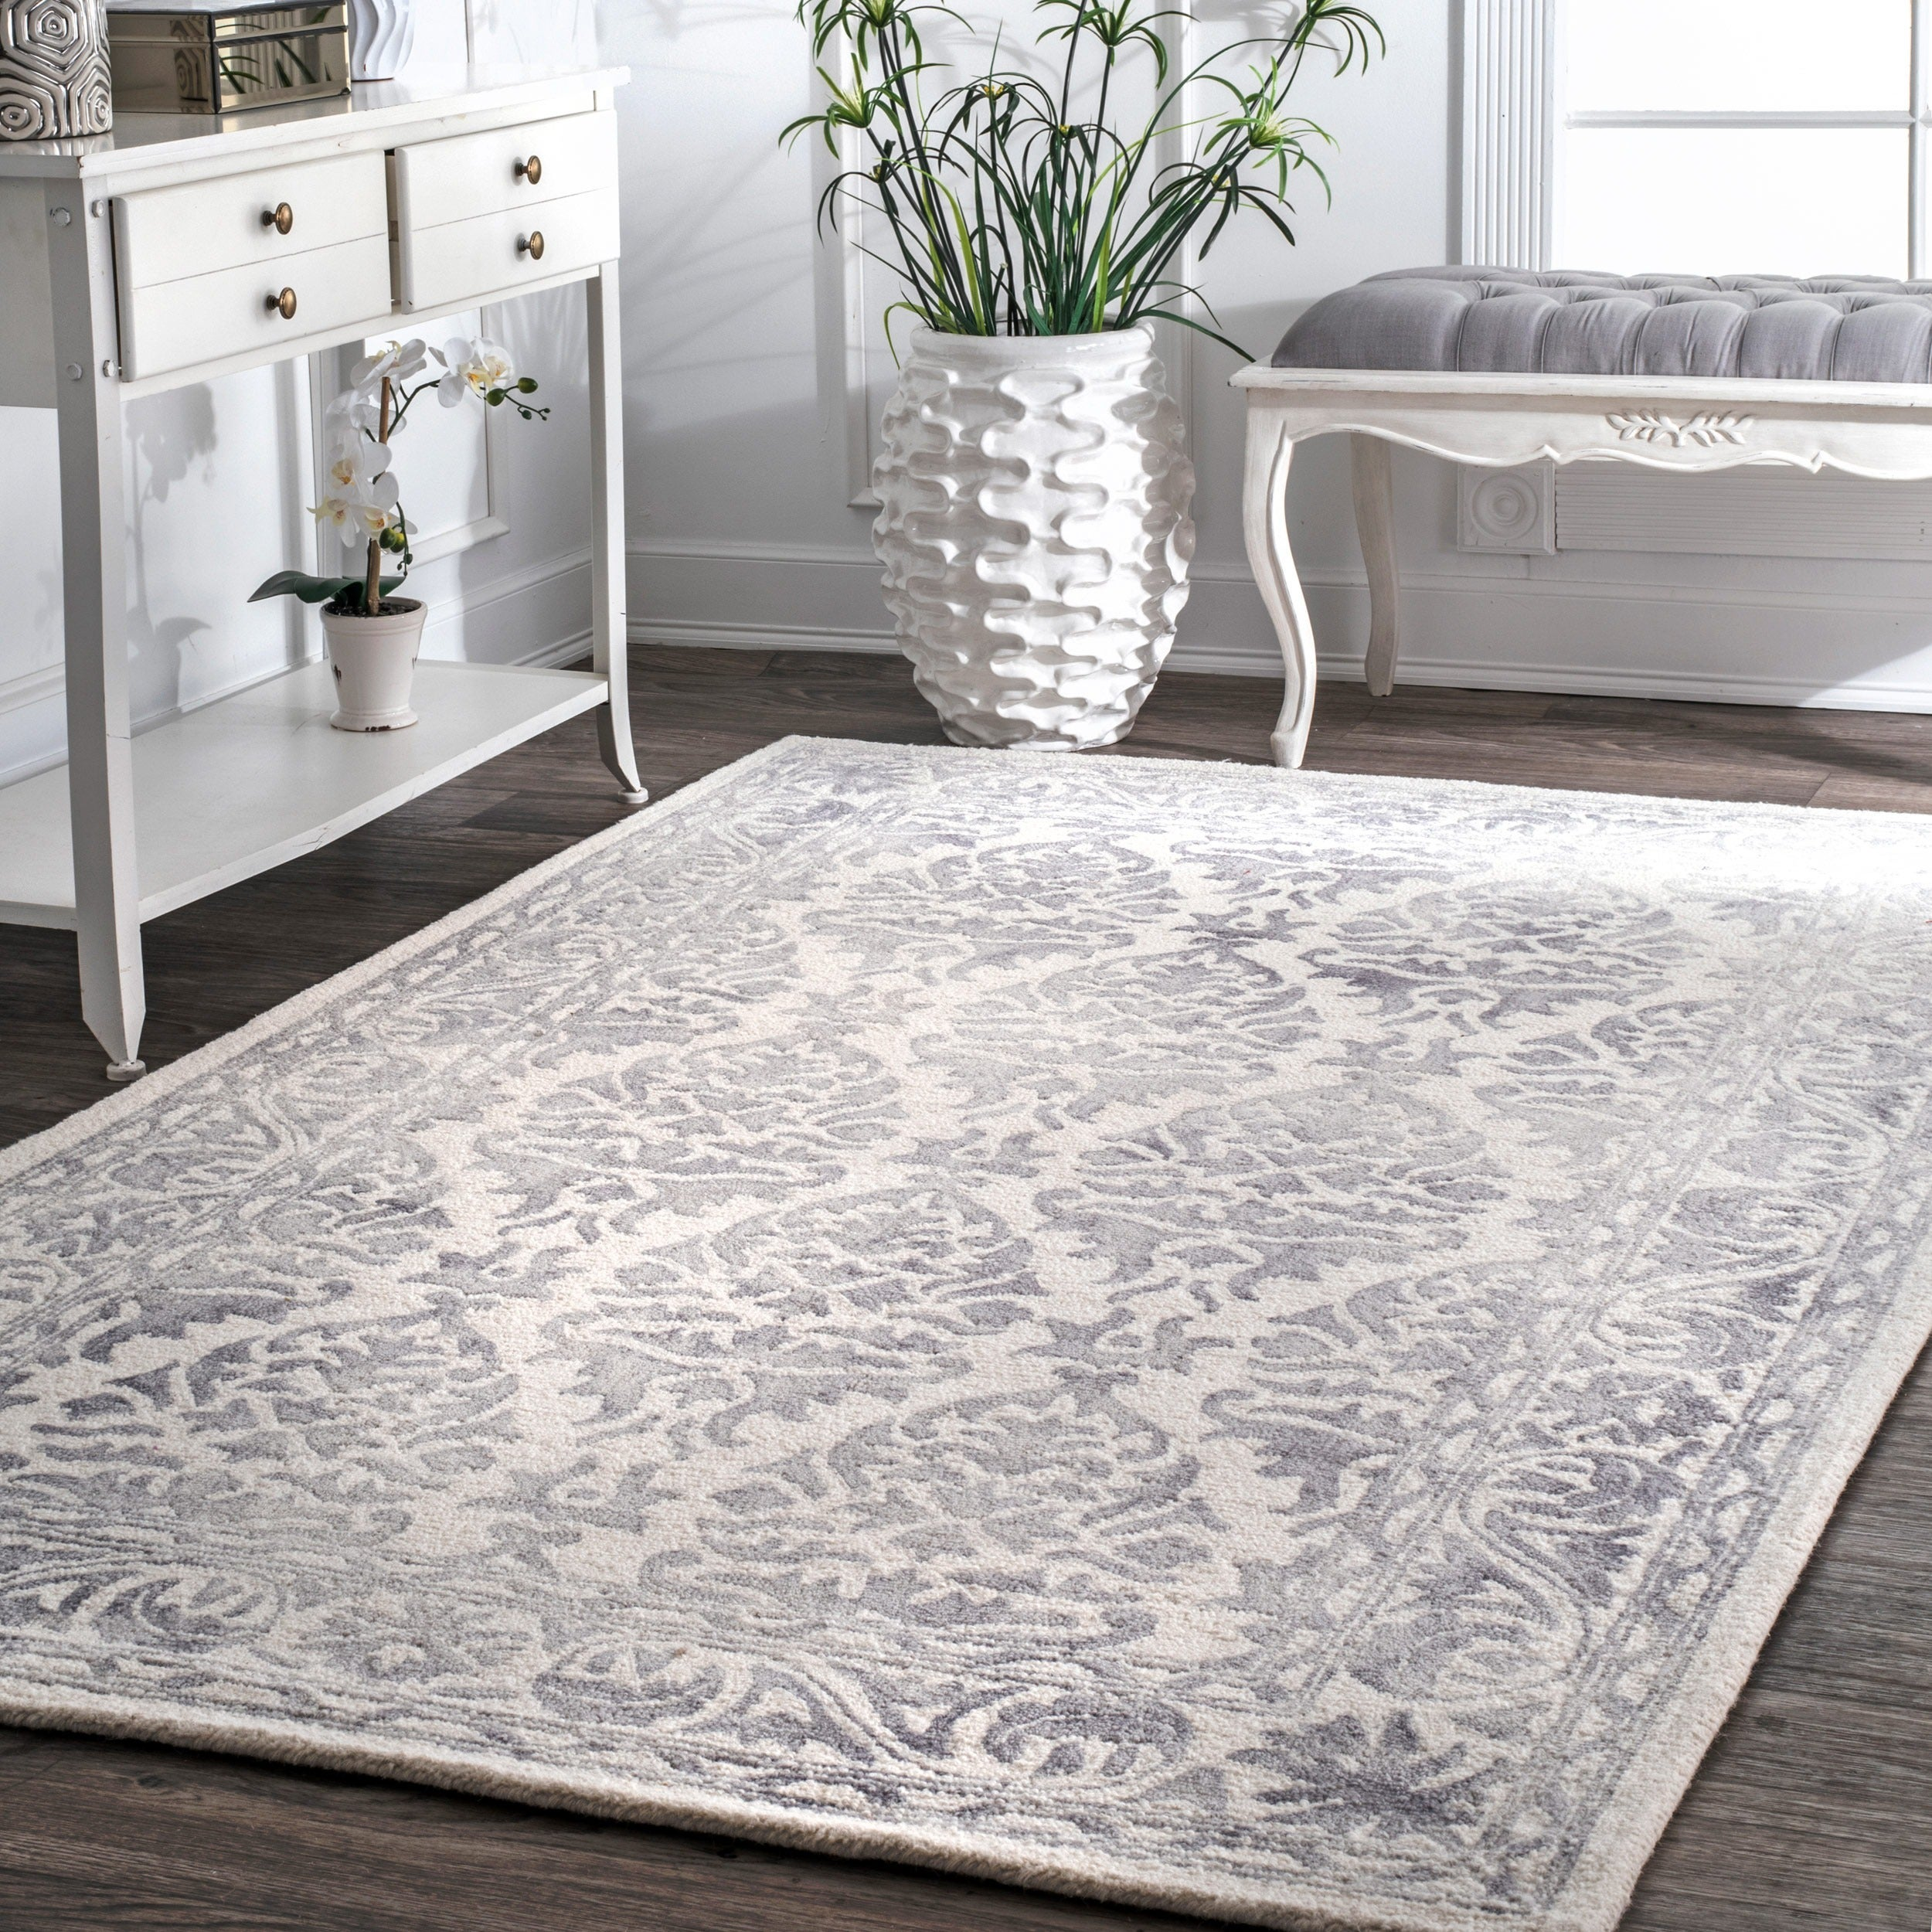 rug moroccan x nuloom modern floral trellis wool runner rugs abstract loom handmade alexa nu